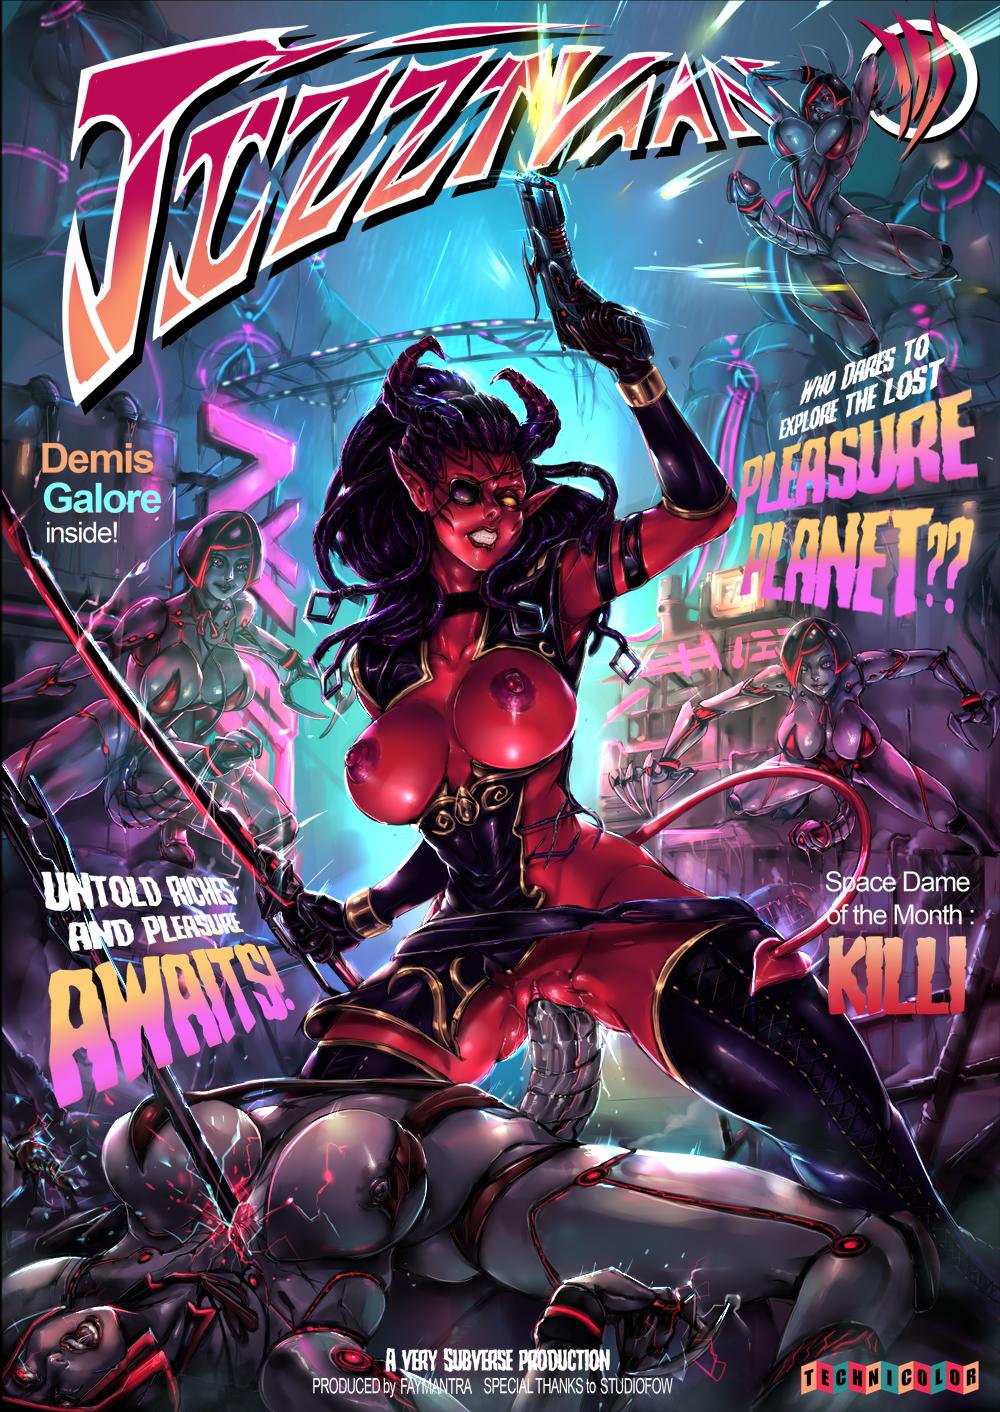 Jizztvaan 3 mag cover featuring Killi